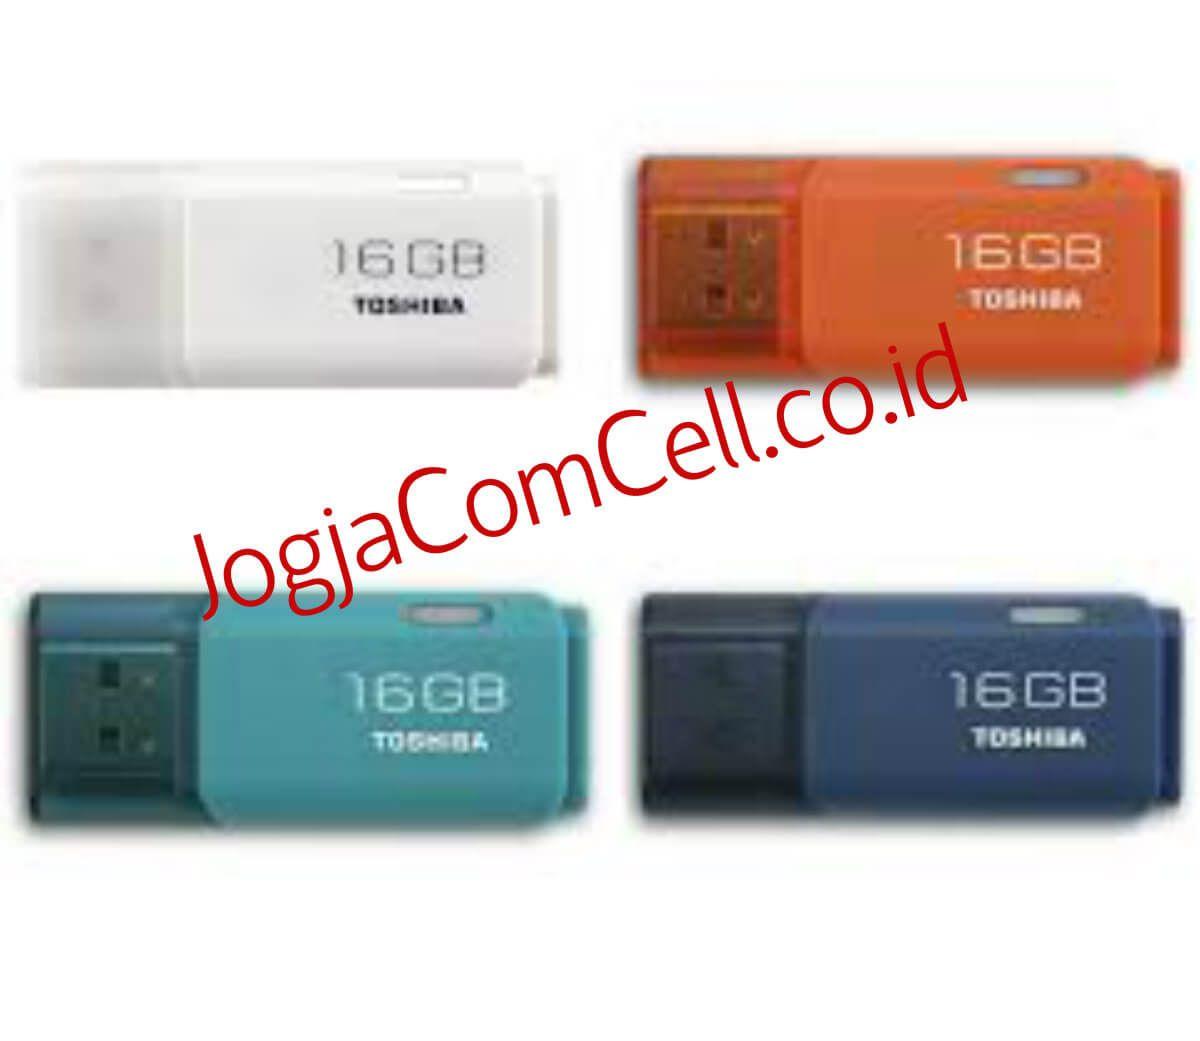 Flashdisk 16gb Toshiba Hayabusa Original Usb Flash Disk Drive Transmemory